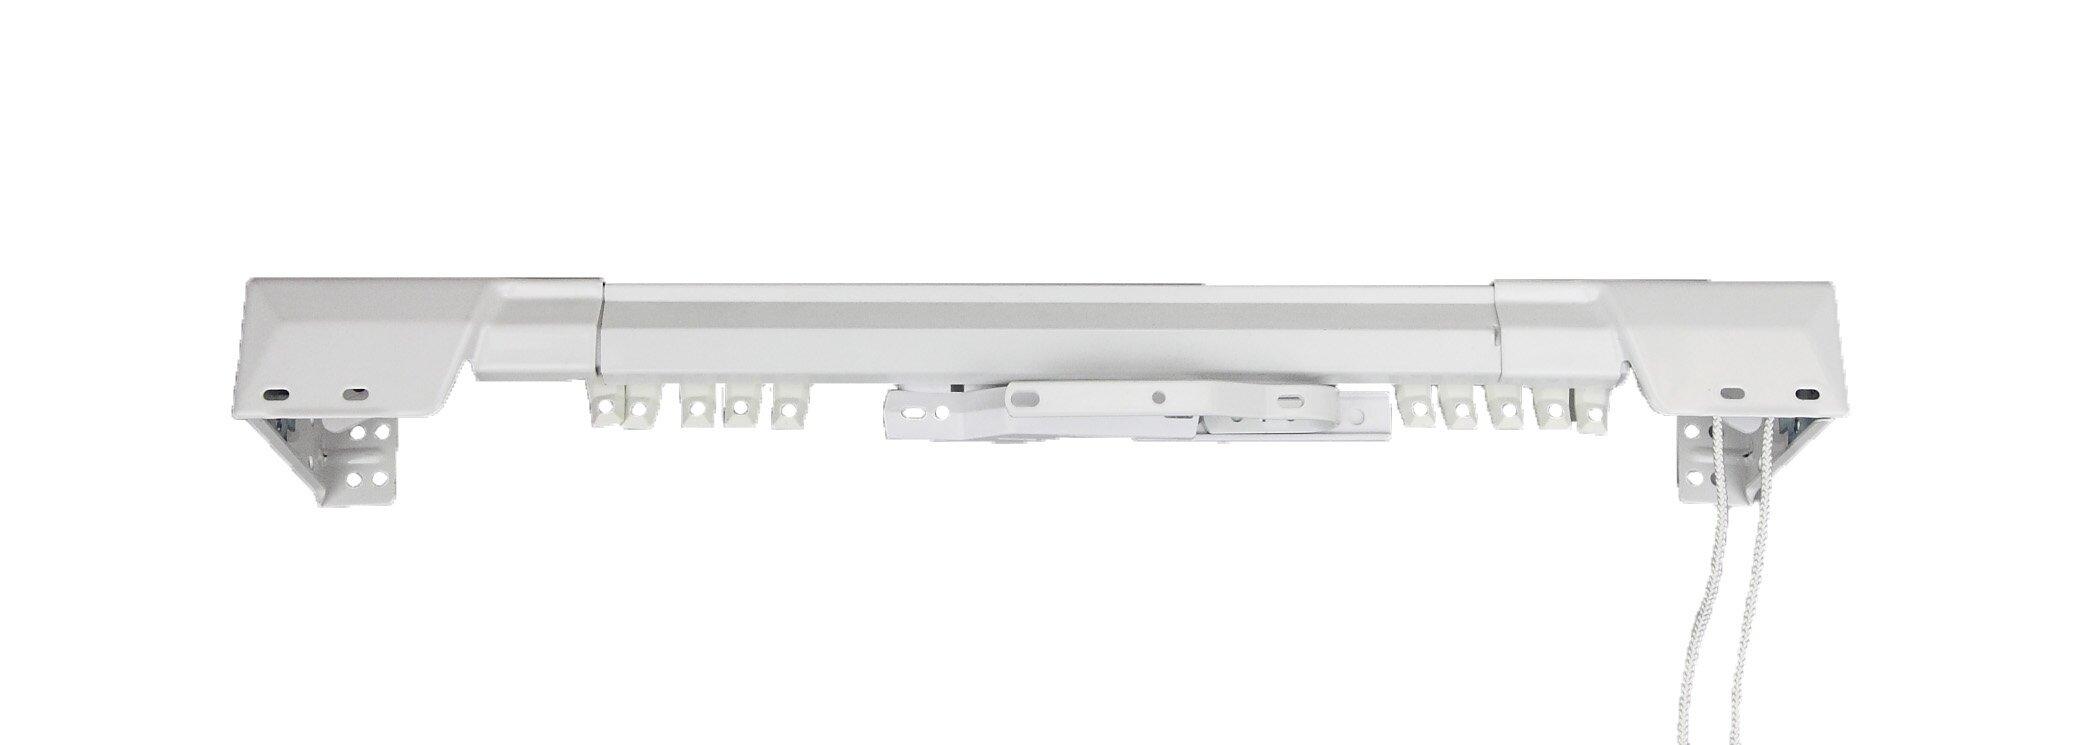 White Traverse Heavy Duty Single Curtain Rod and Hardware Set